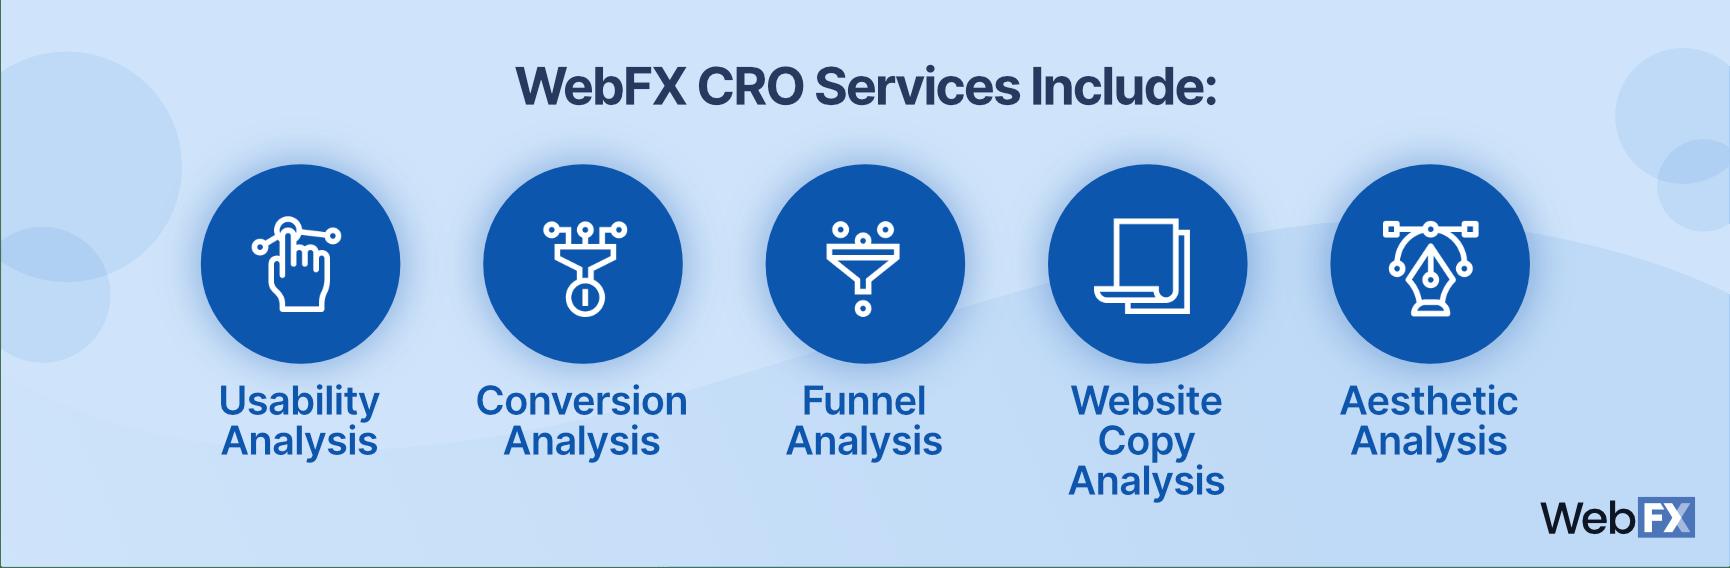 webfx cro services include